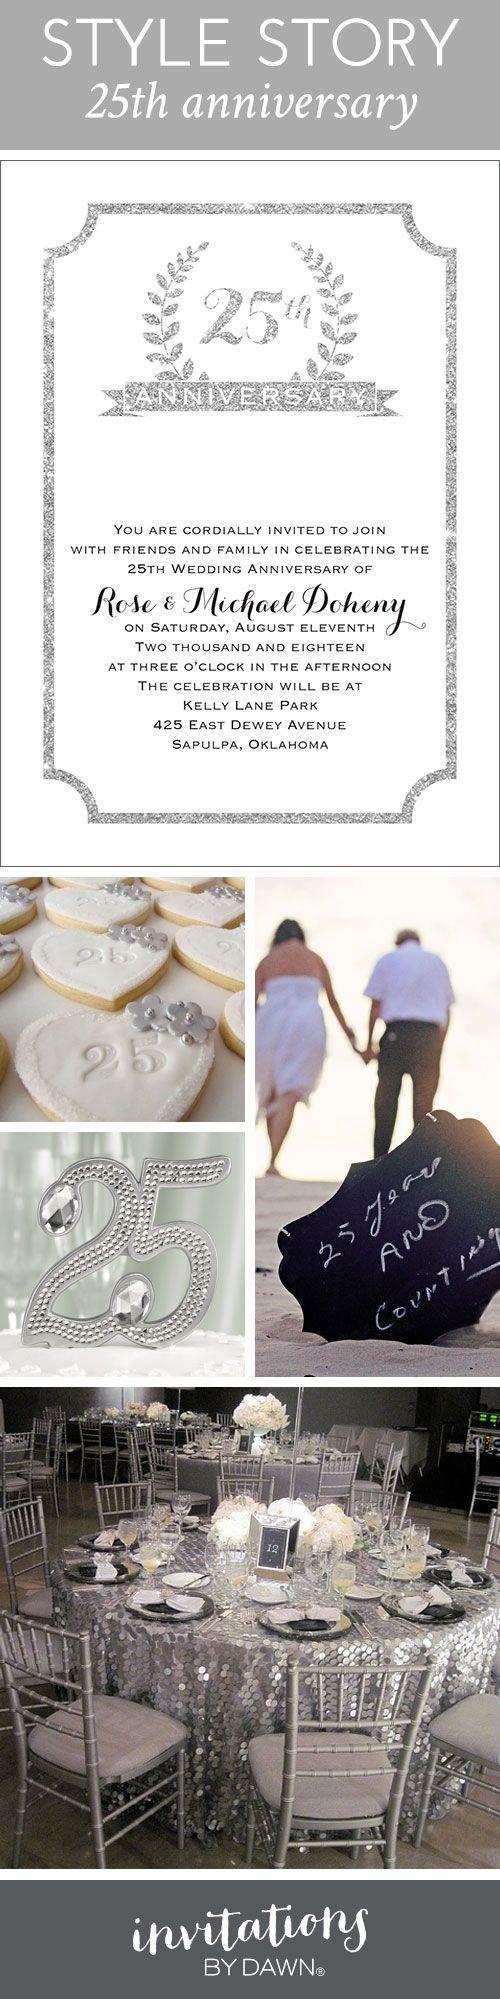 sapphire wedding anniversary invitations%0A Style Story    Th Anniversary  Anniversary Invitations   Wedding